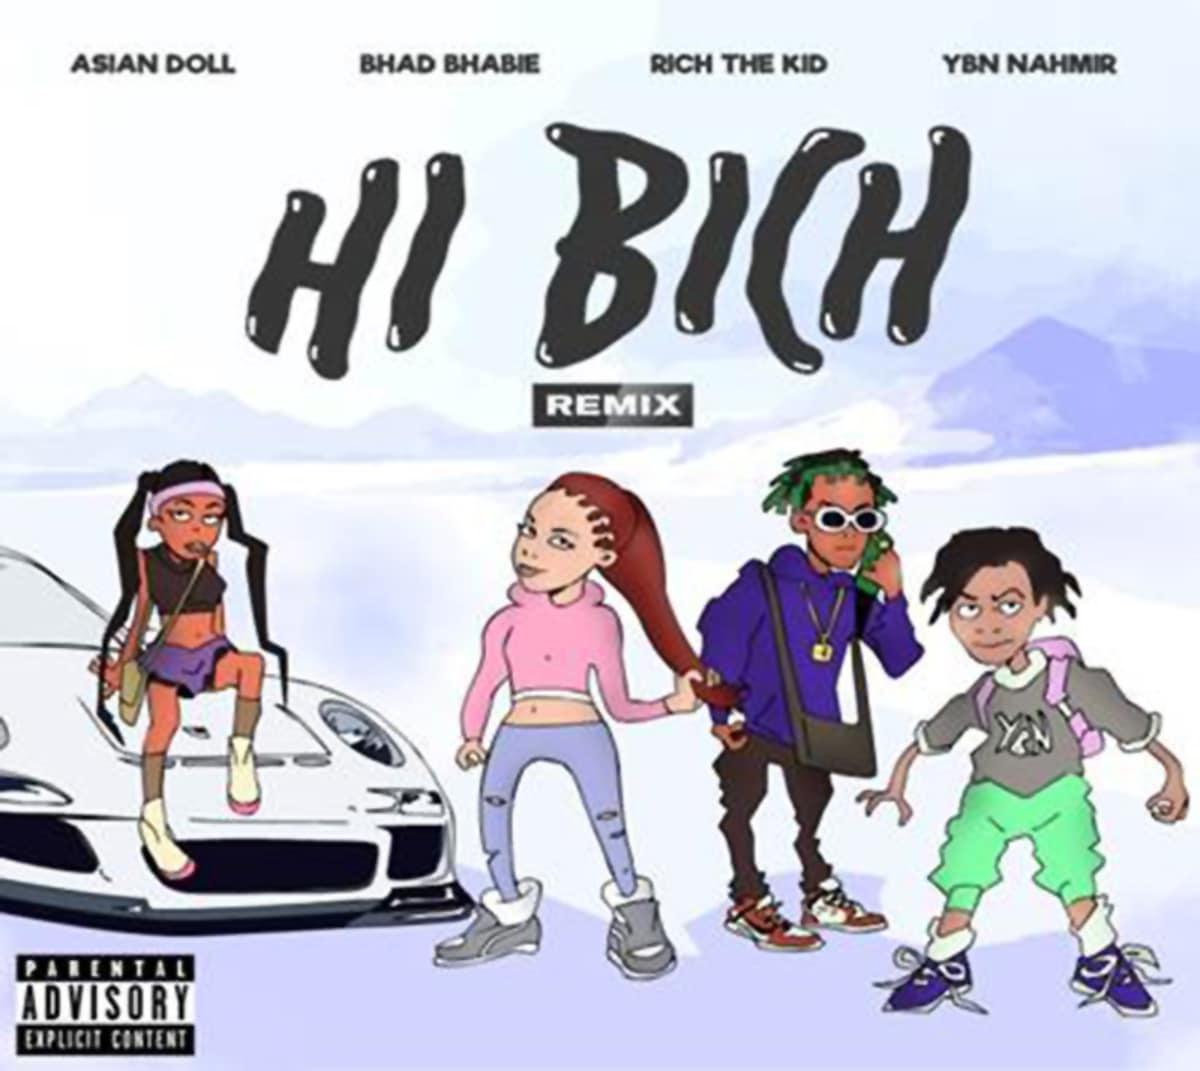 bhad-bhabie-hi-bich-remix.jpg